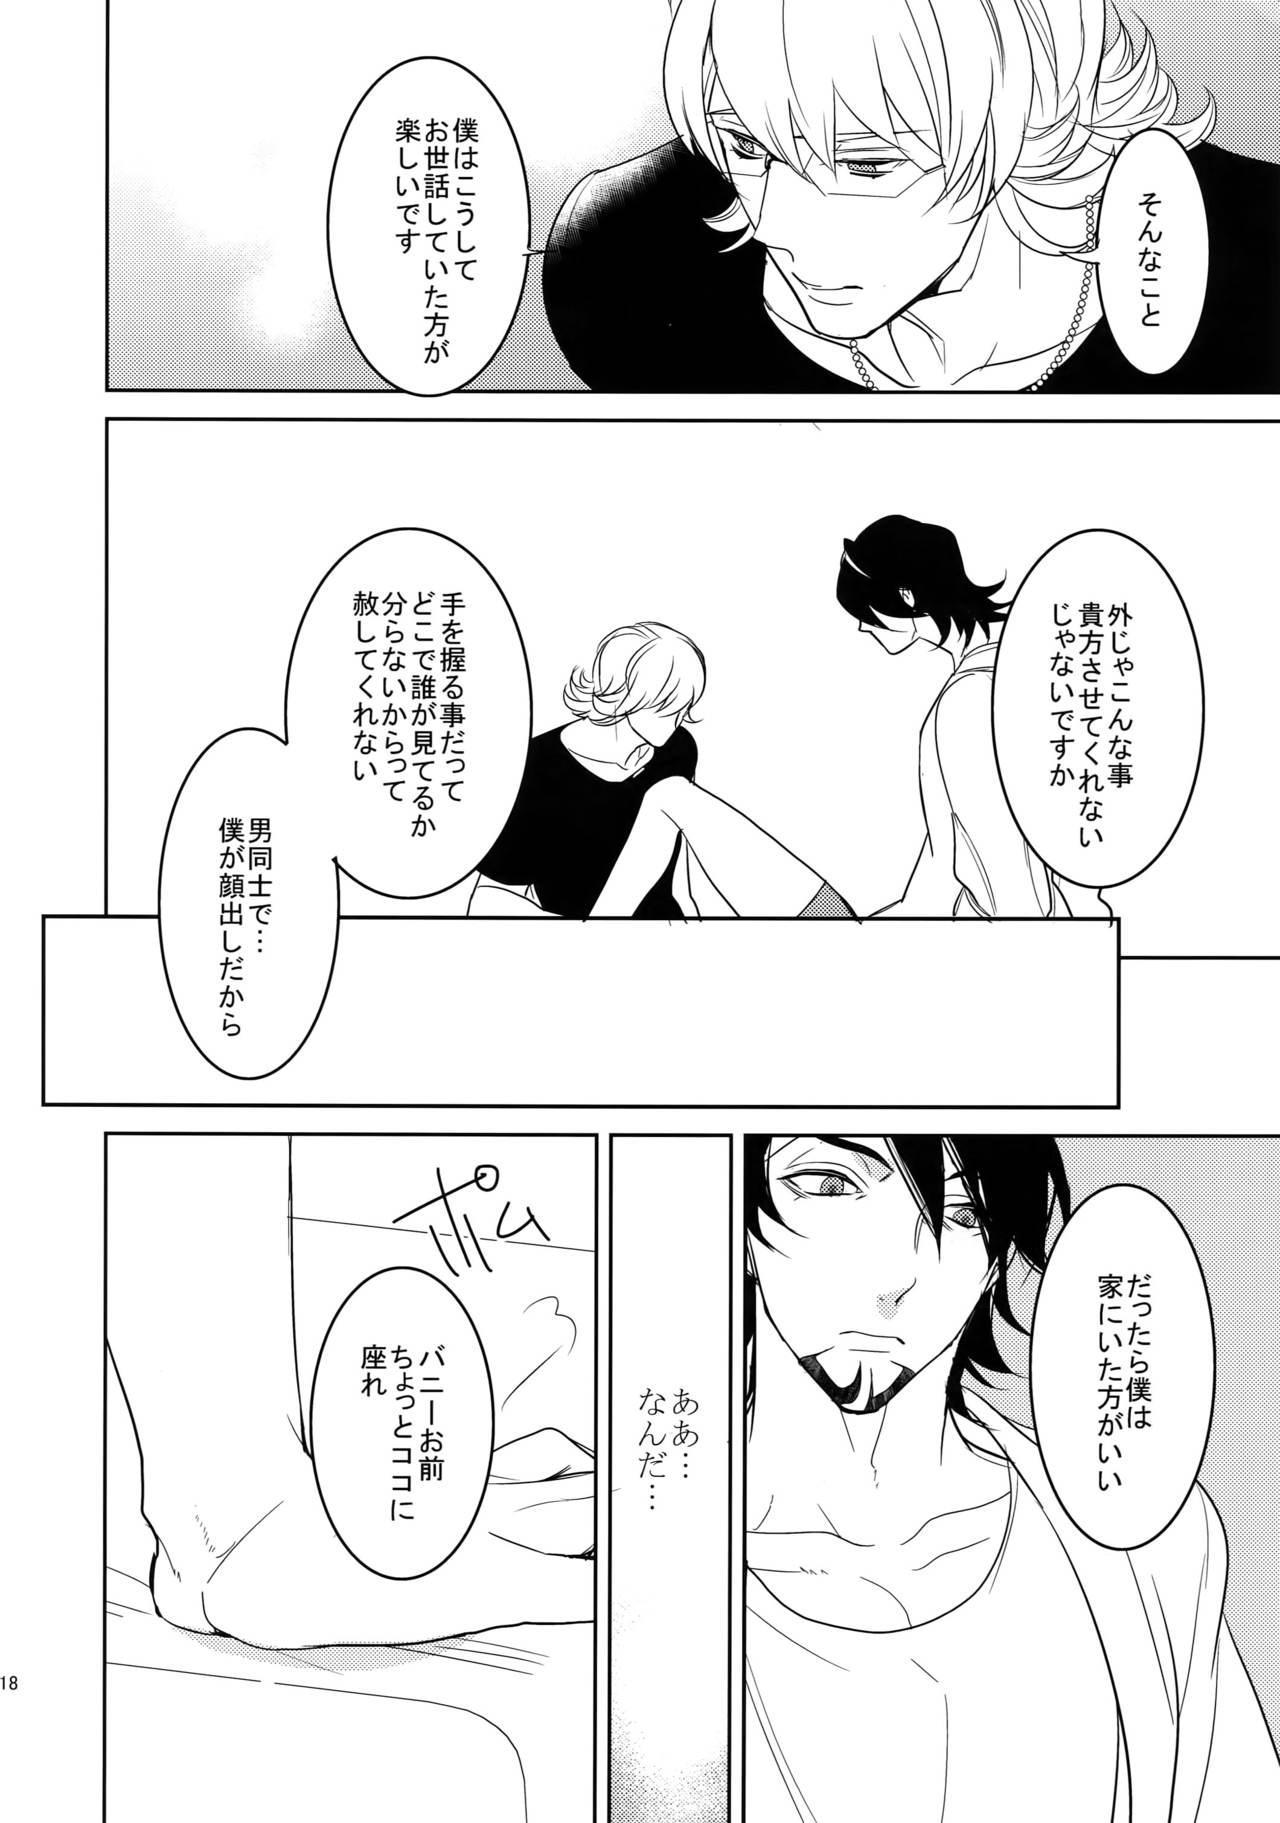 BOROZS Usagi Tora Sairoku 2 216